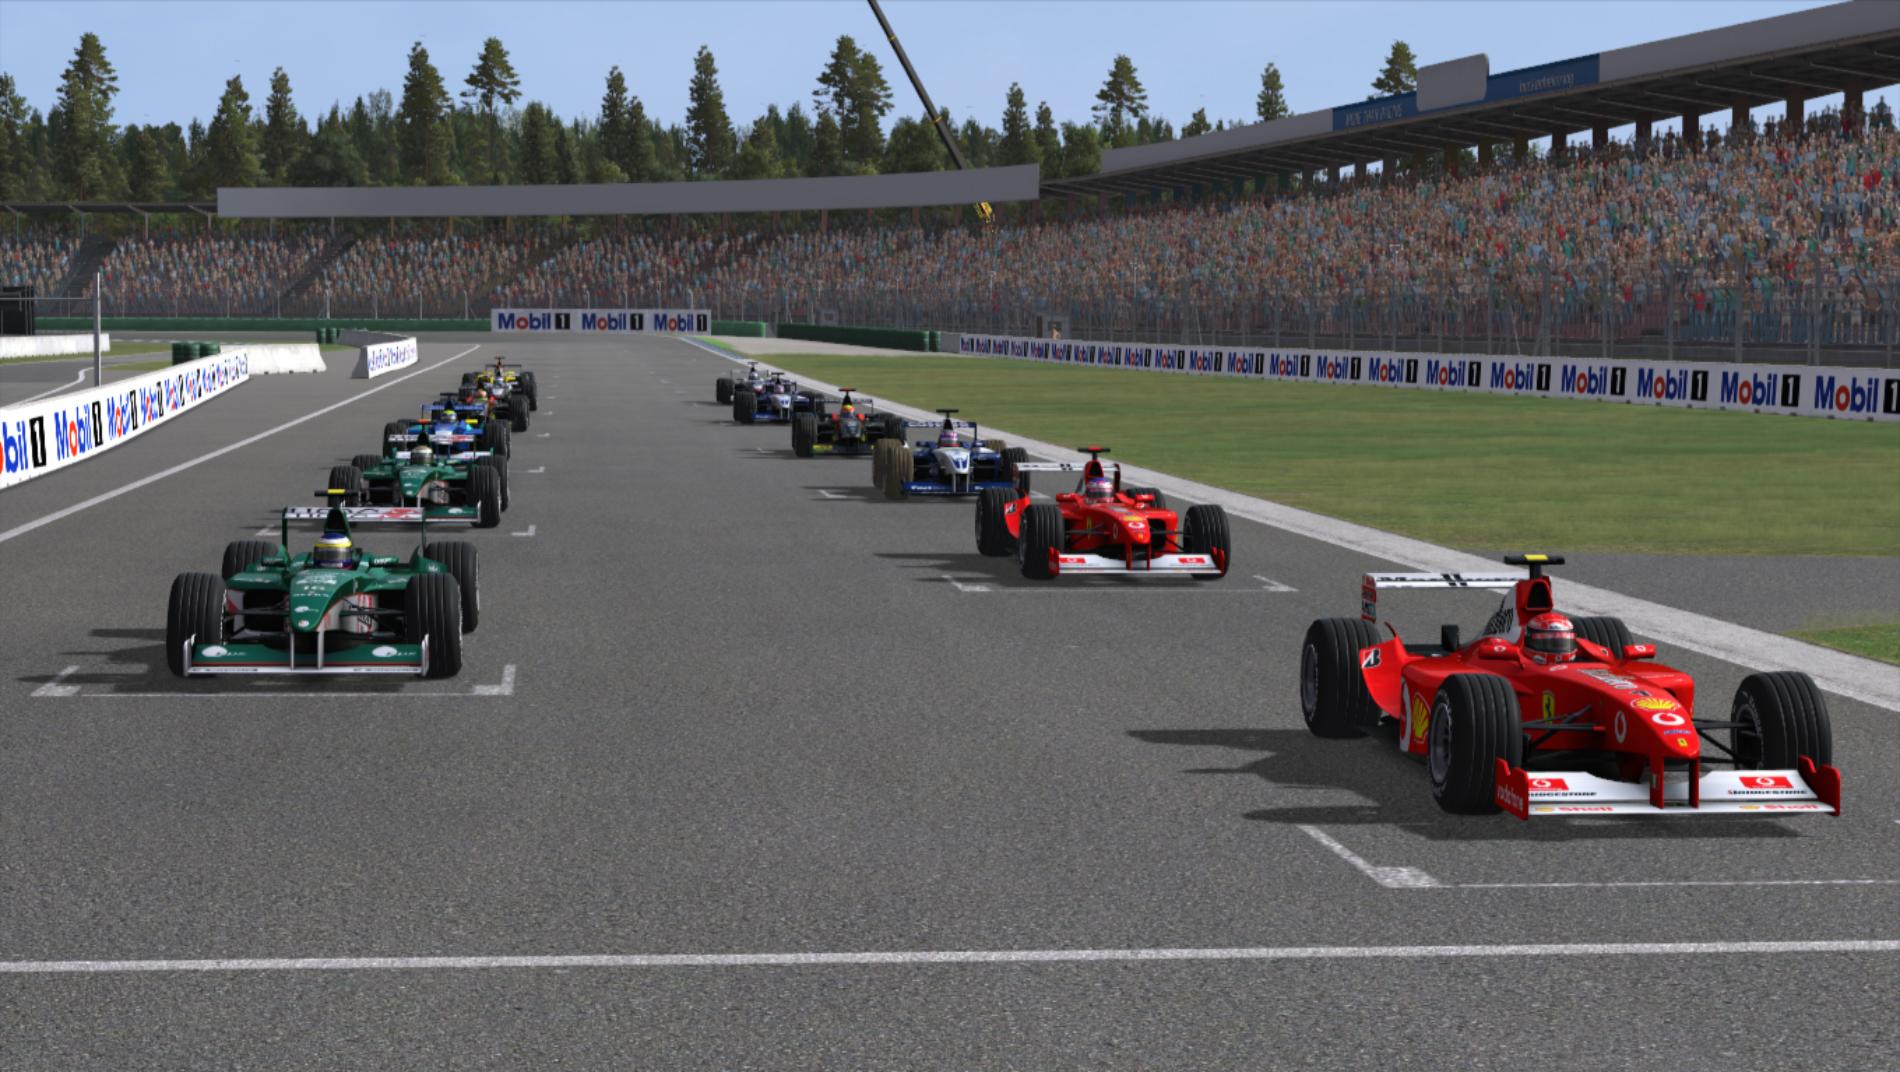 Resumen | hockenheimring| Kiboyuka acaba con el dominio de Ferrari.